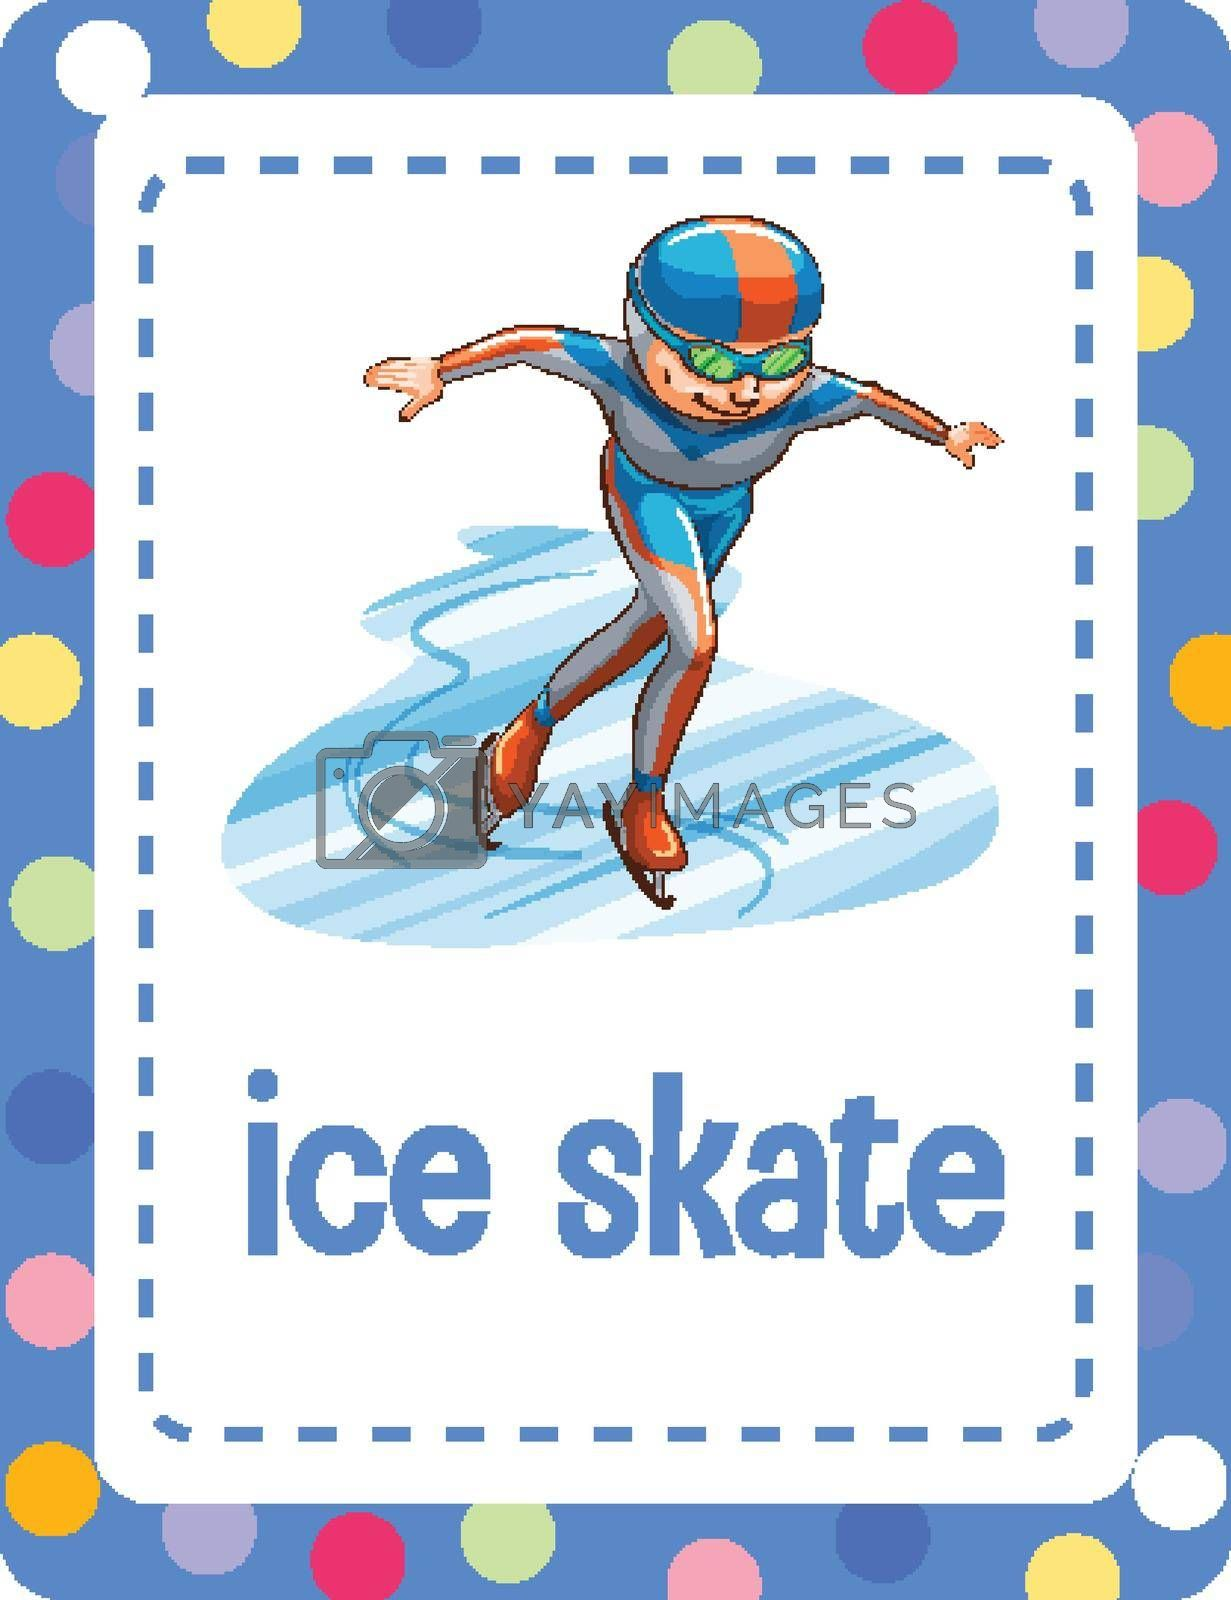 Vocabulary flashcard with word Ice skate illustration